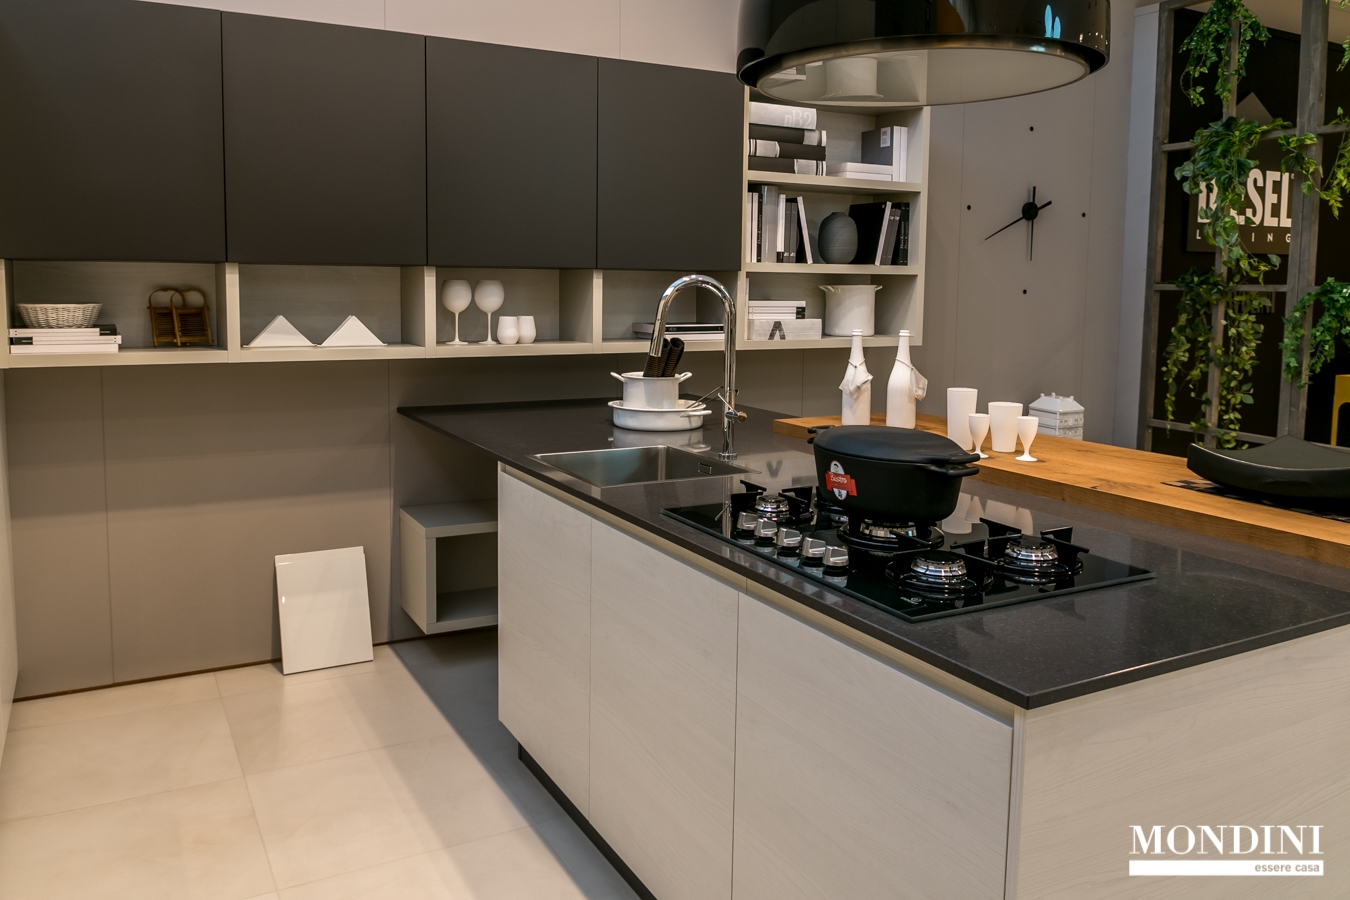 Isola pallet idee cucina - Isola cucina fai da te ...